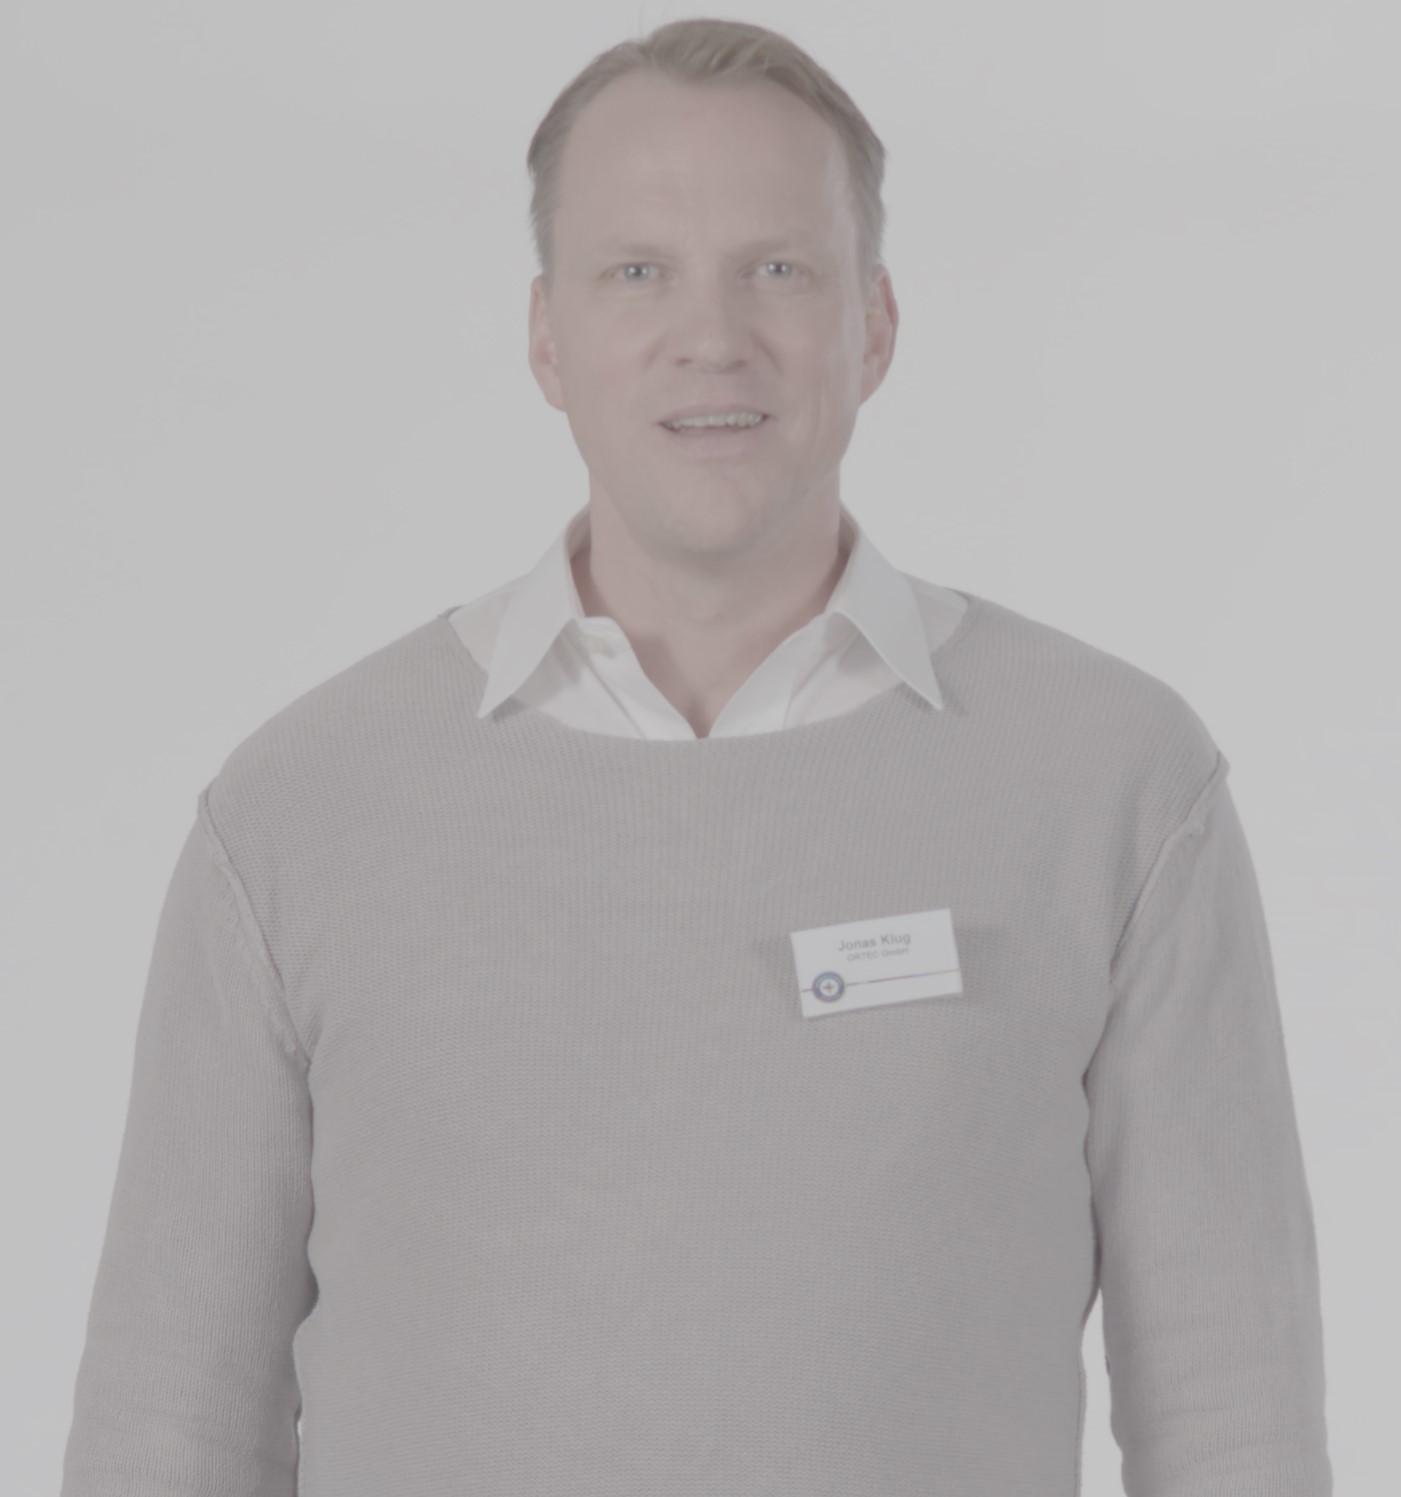 Heute – Brandaktuell –  Neue Videos zum Thema SAP Add-on for SAP ERP & S/4HANA auf YouTube!